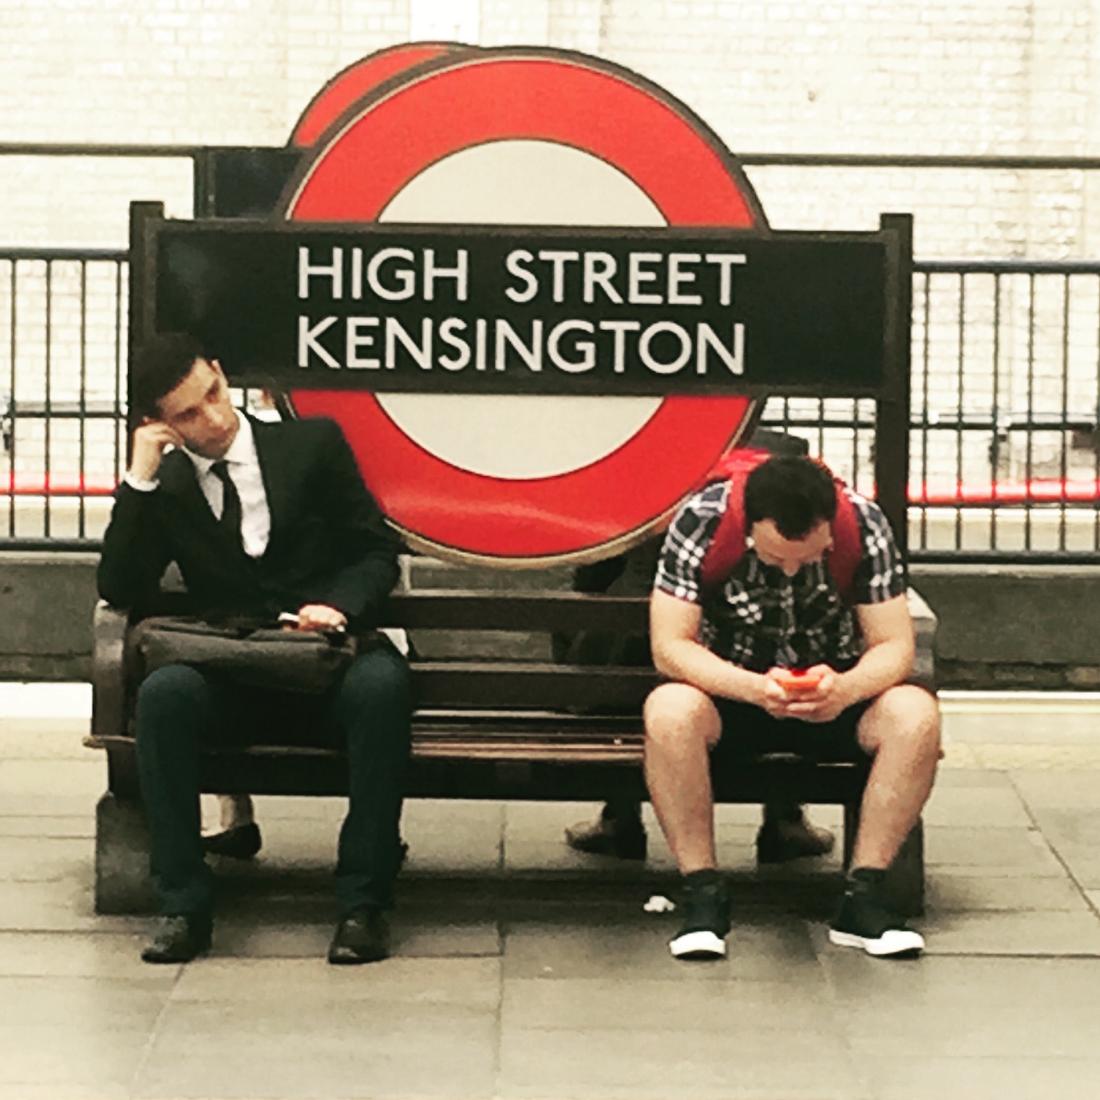 Waiting at High Street Kensington Tube London